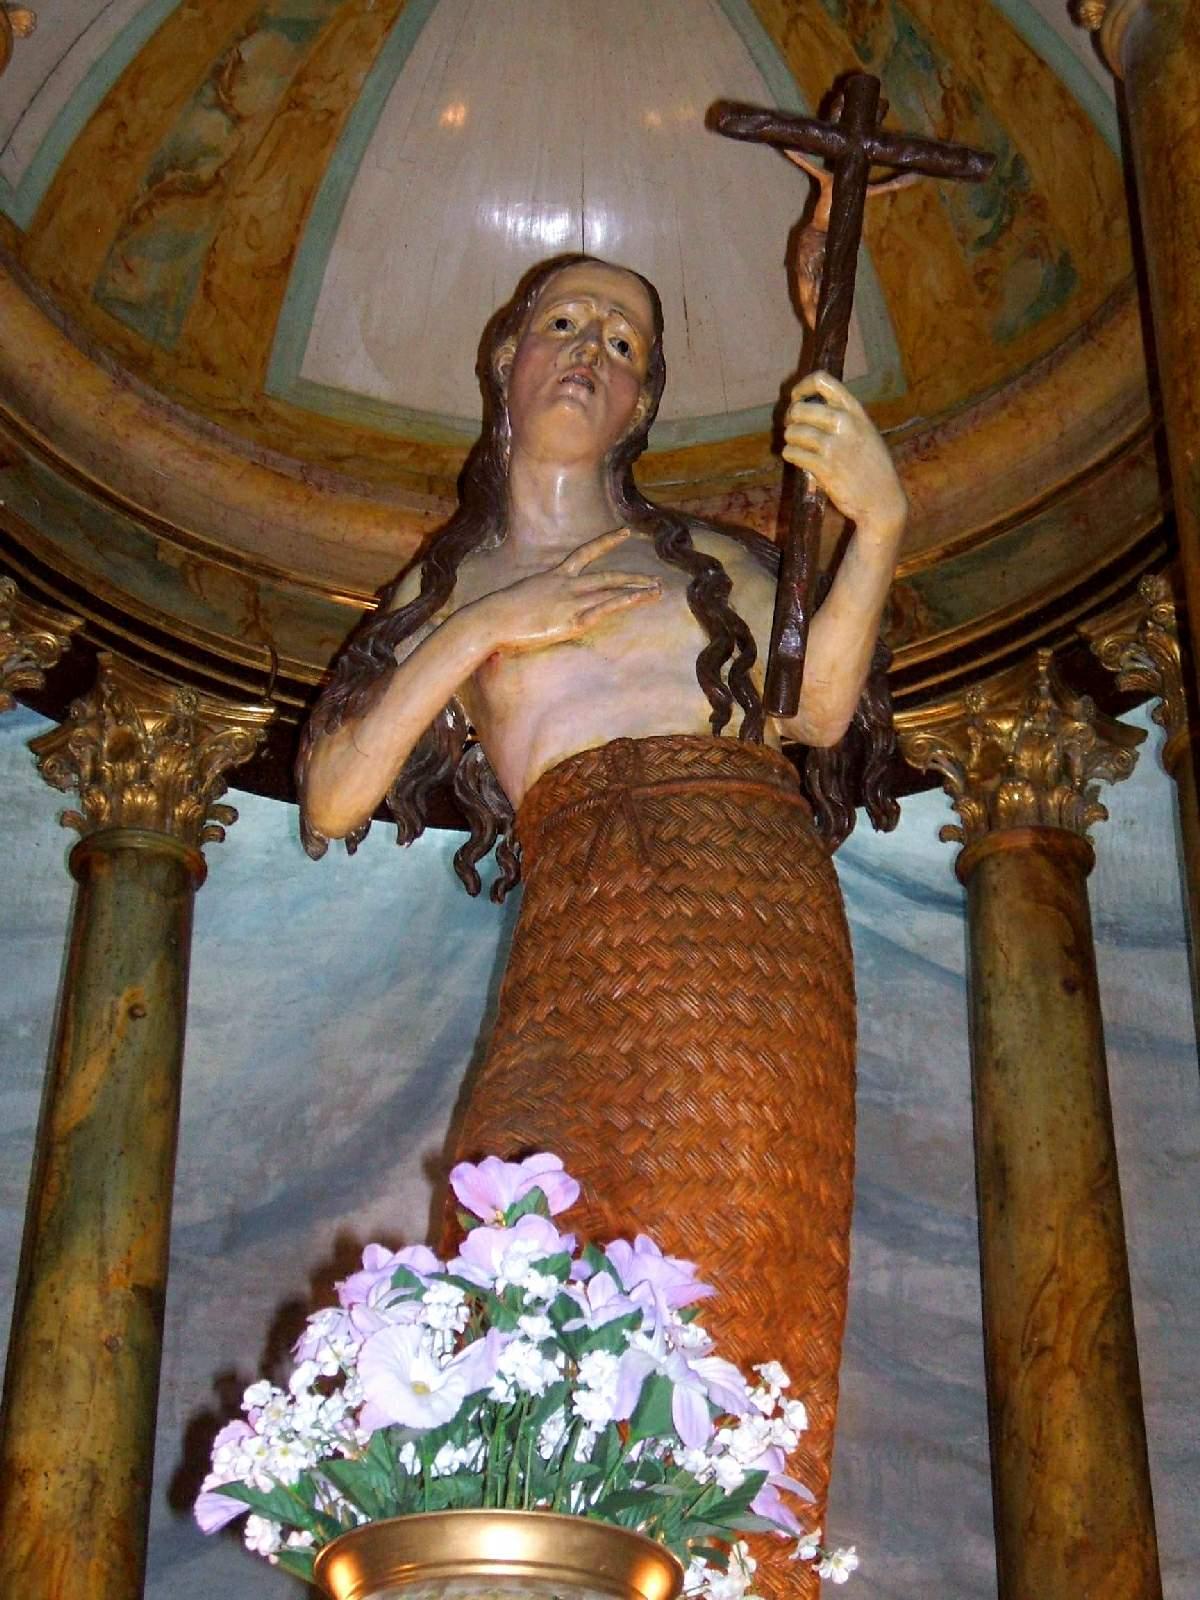 File:Viana - Iglesia de Santa Maria - Capilla de Sta Maria Magdalena 4.jpg